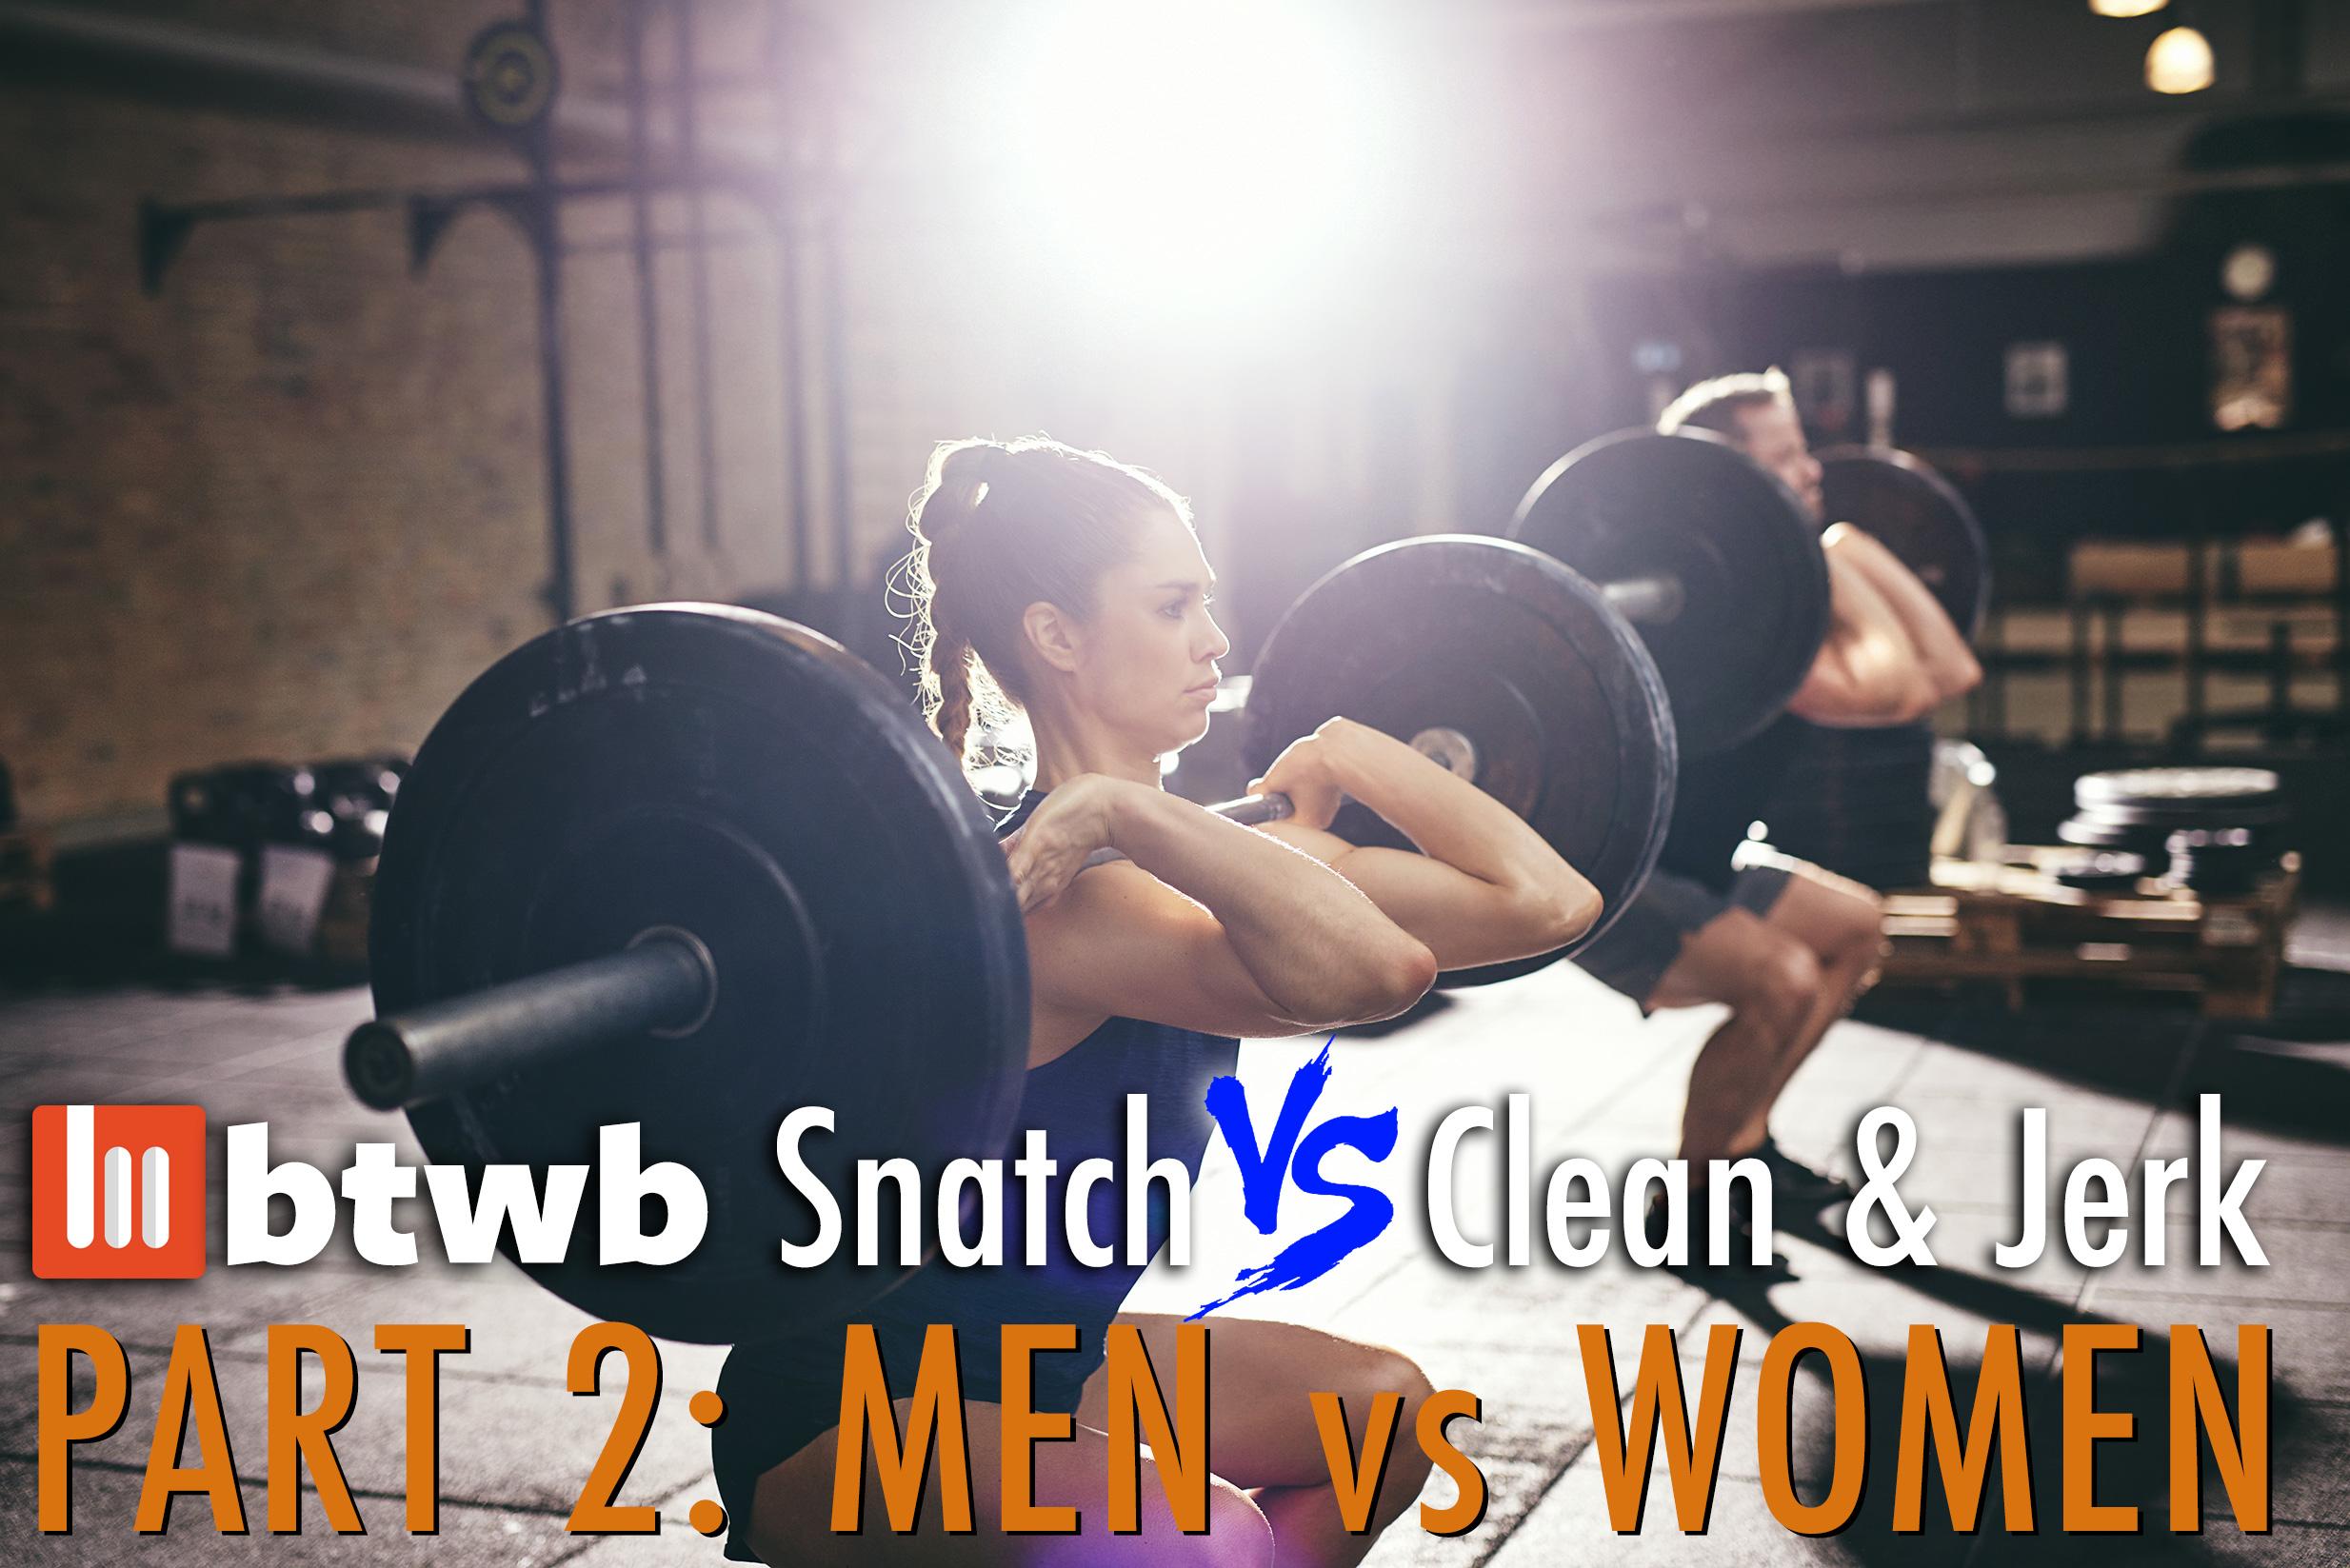 Snatch vs Clean & Jerk Part 2: Men vs Women – btwb blog